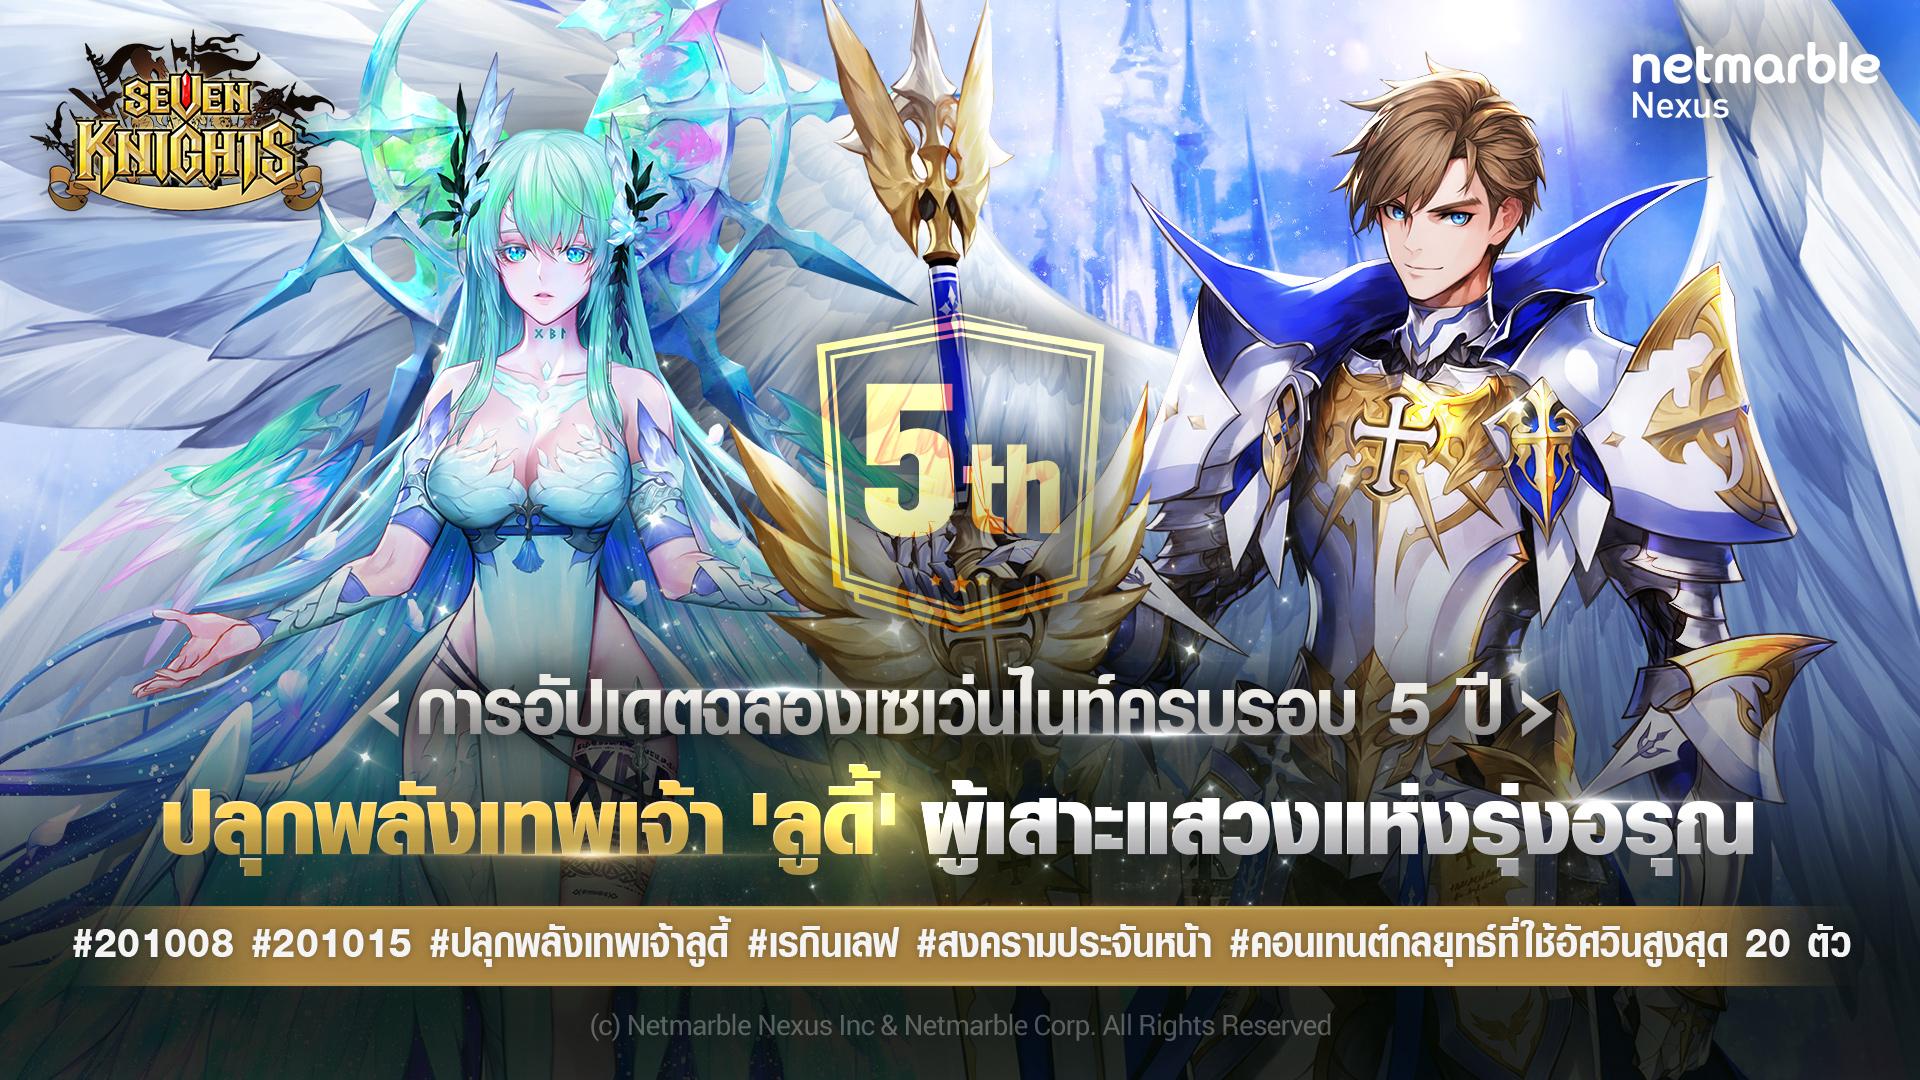 Seven Knights 8102020 4